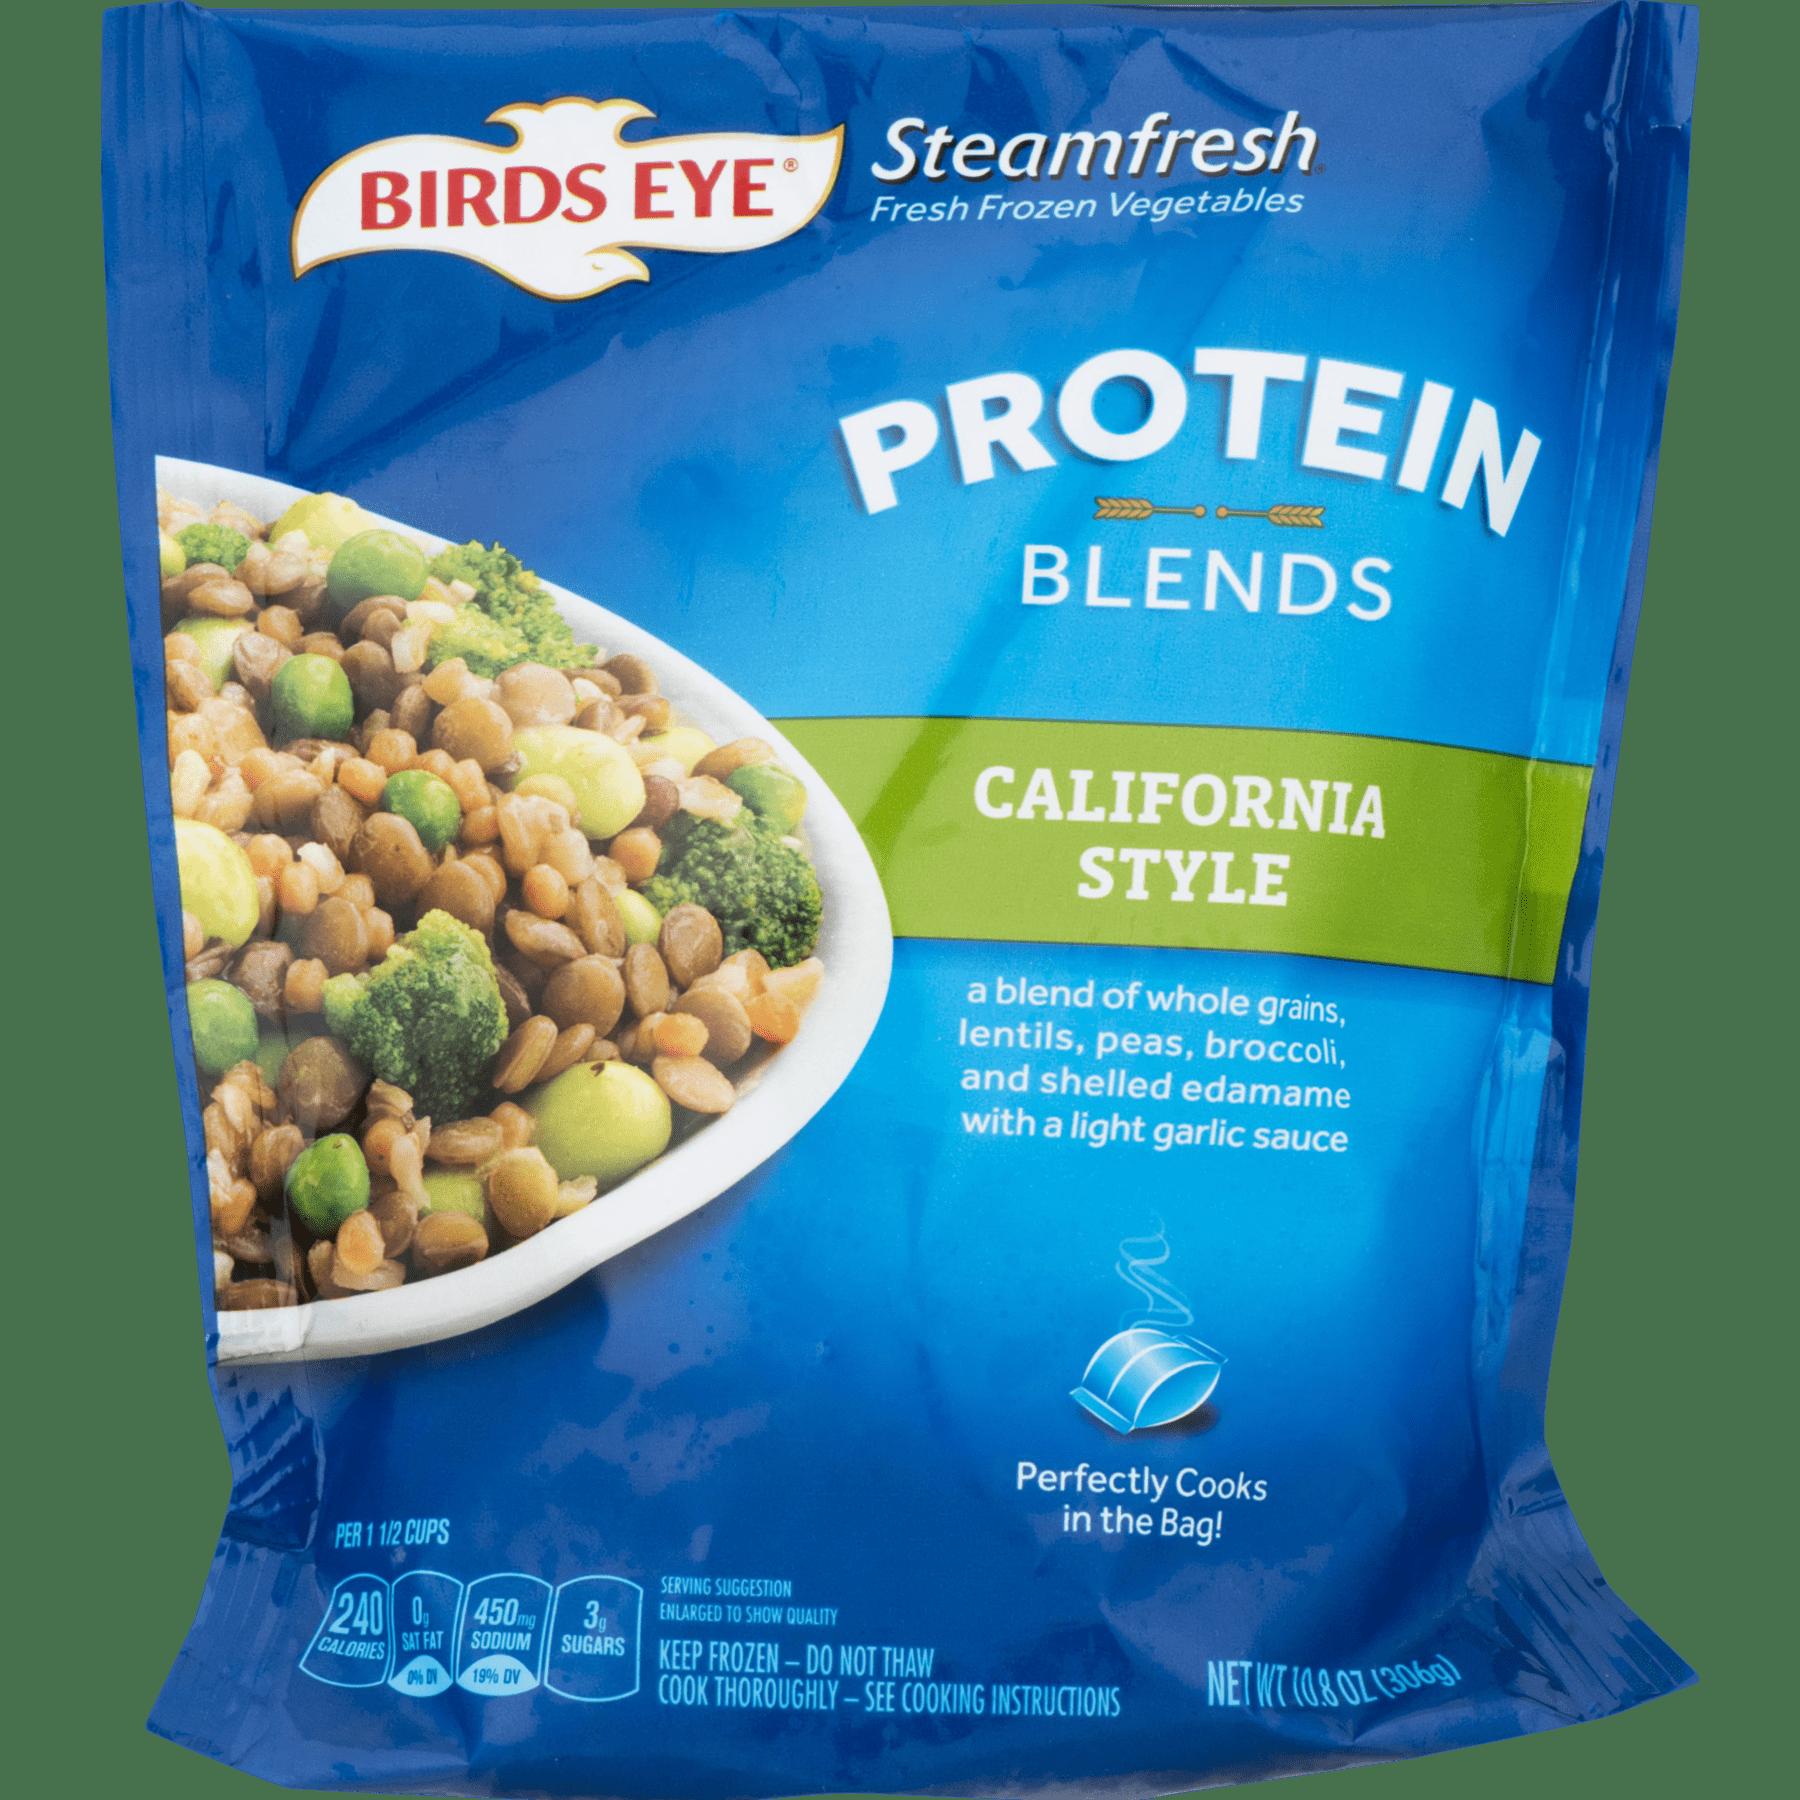 Birds Eye Steamfresh California Style Protein Blends, 10.8 oz ...